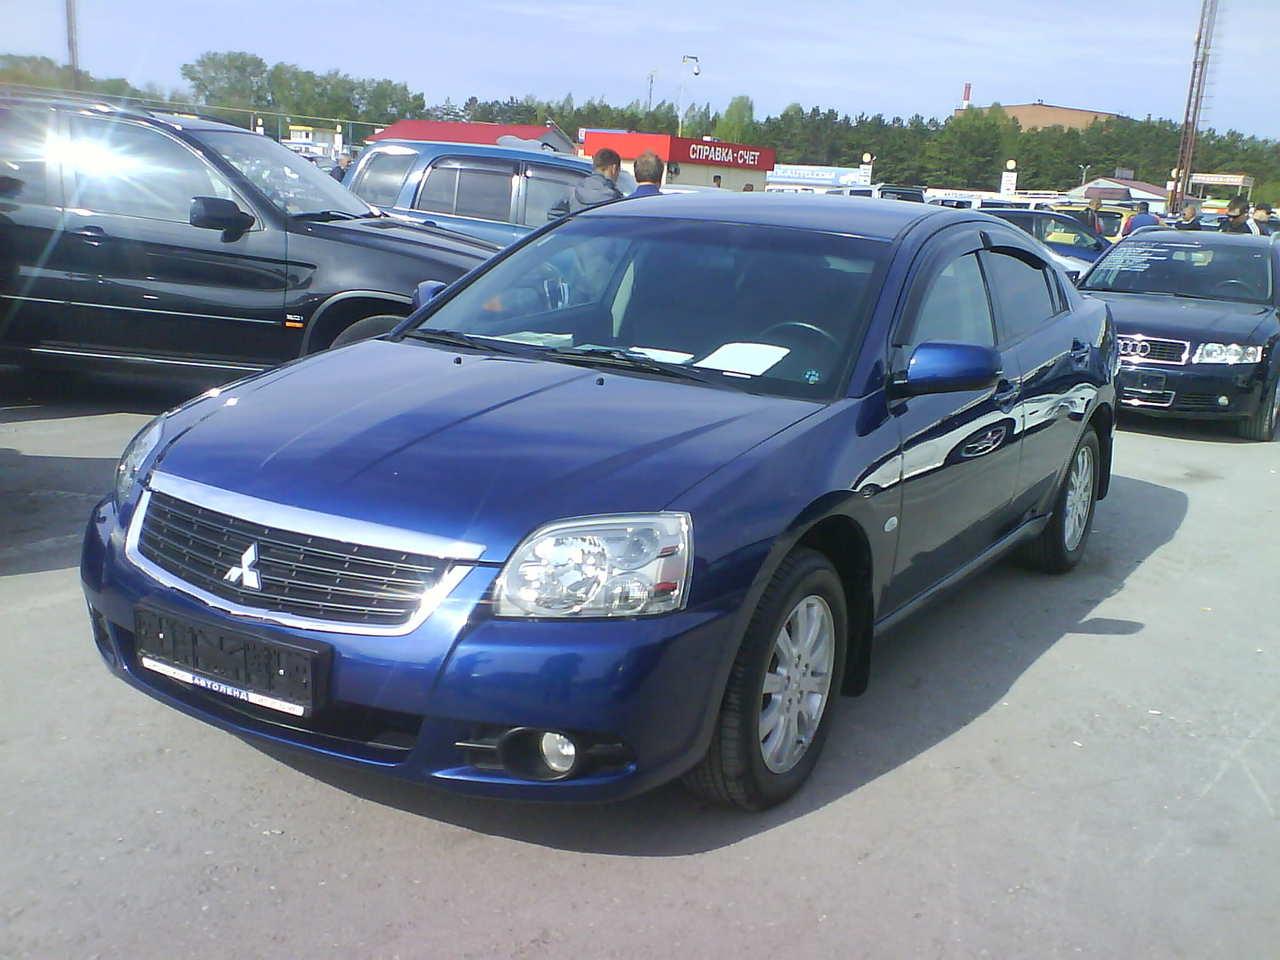 Used 2008 Mitsubishi Galant Photos, 2400cc., Gasoline, FF, Automatic For Sale